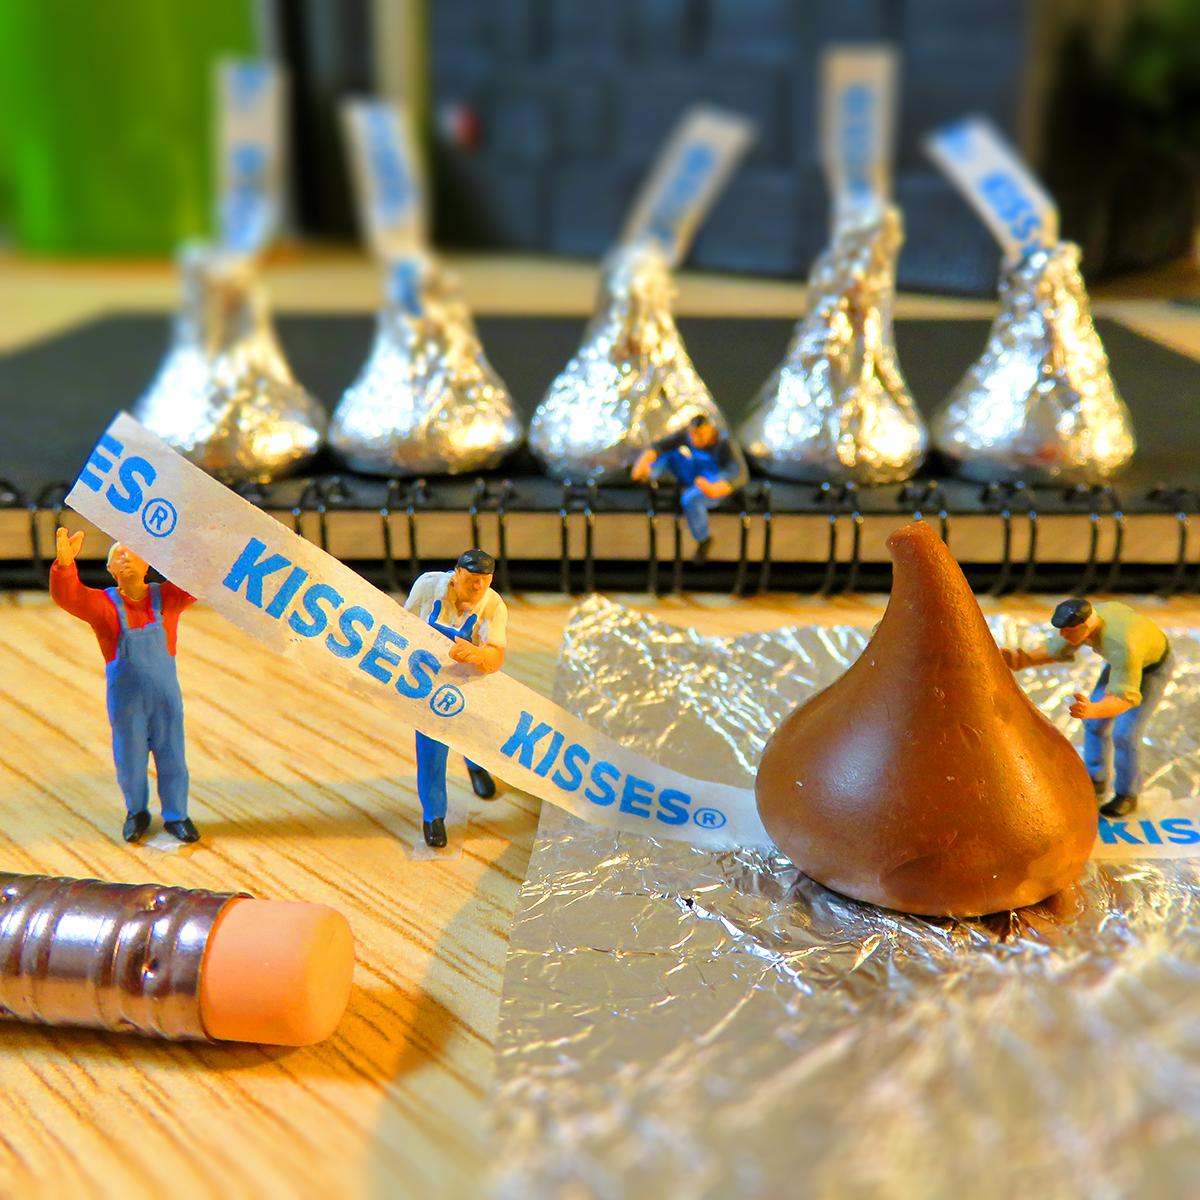 HERSHEY'Sの秘密暴露!キスチョコレートの包み紙は小さな作業員が包装していた!